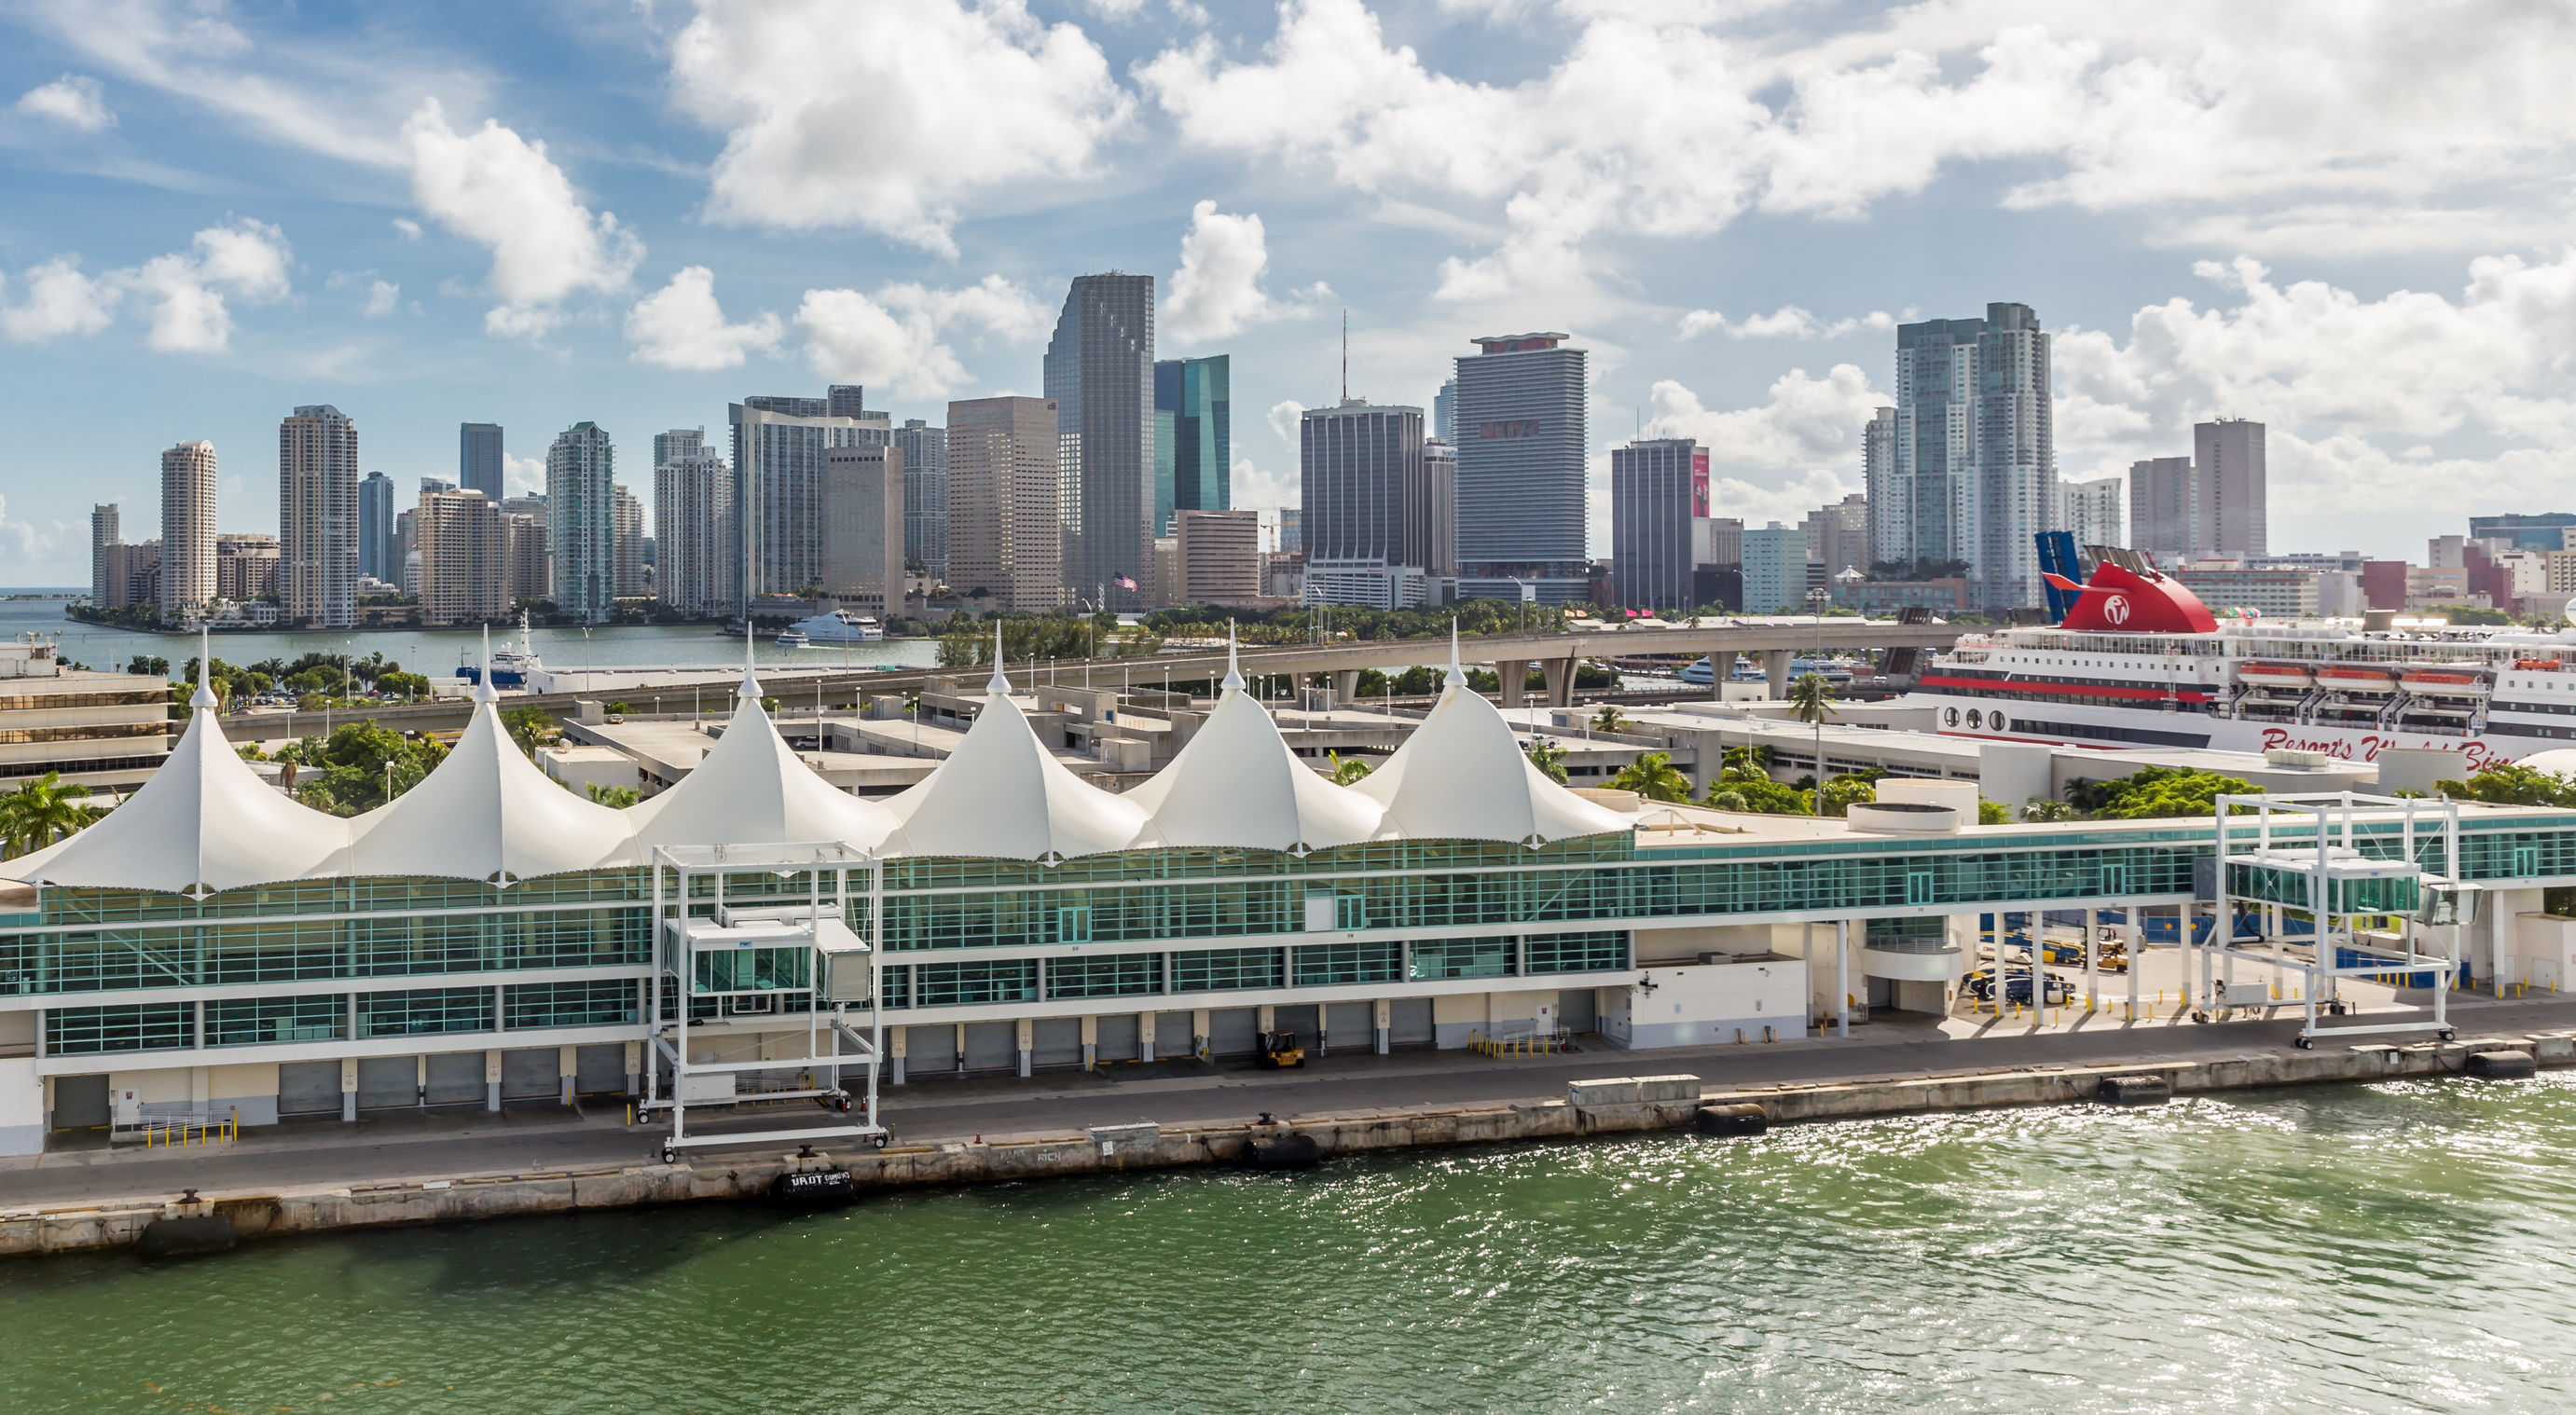 Miami Fl Cruise Ship Injury Lawyer LWM Legal - Cruise ship port in miami